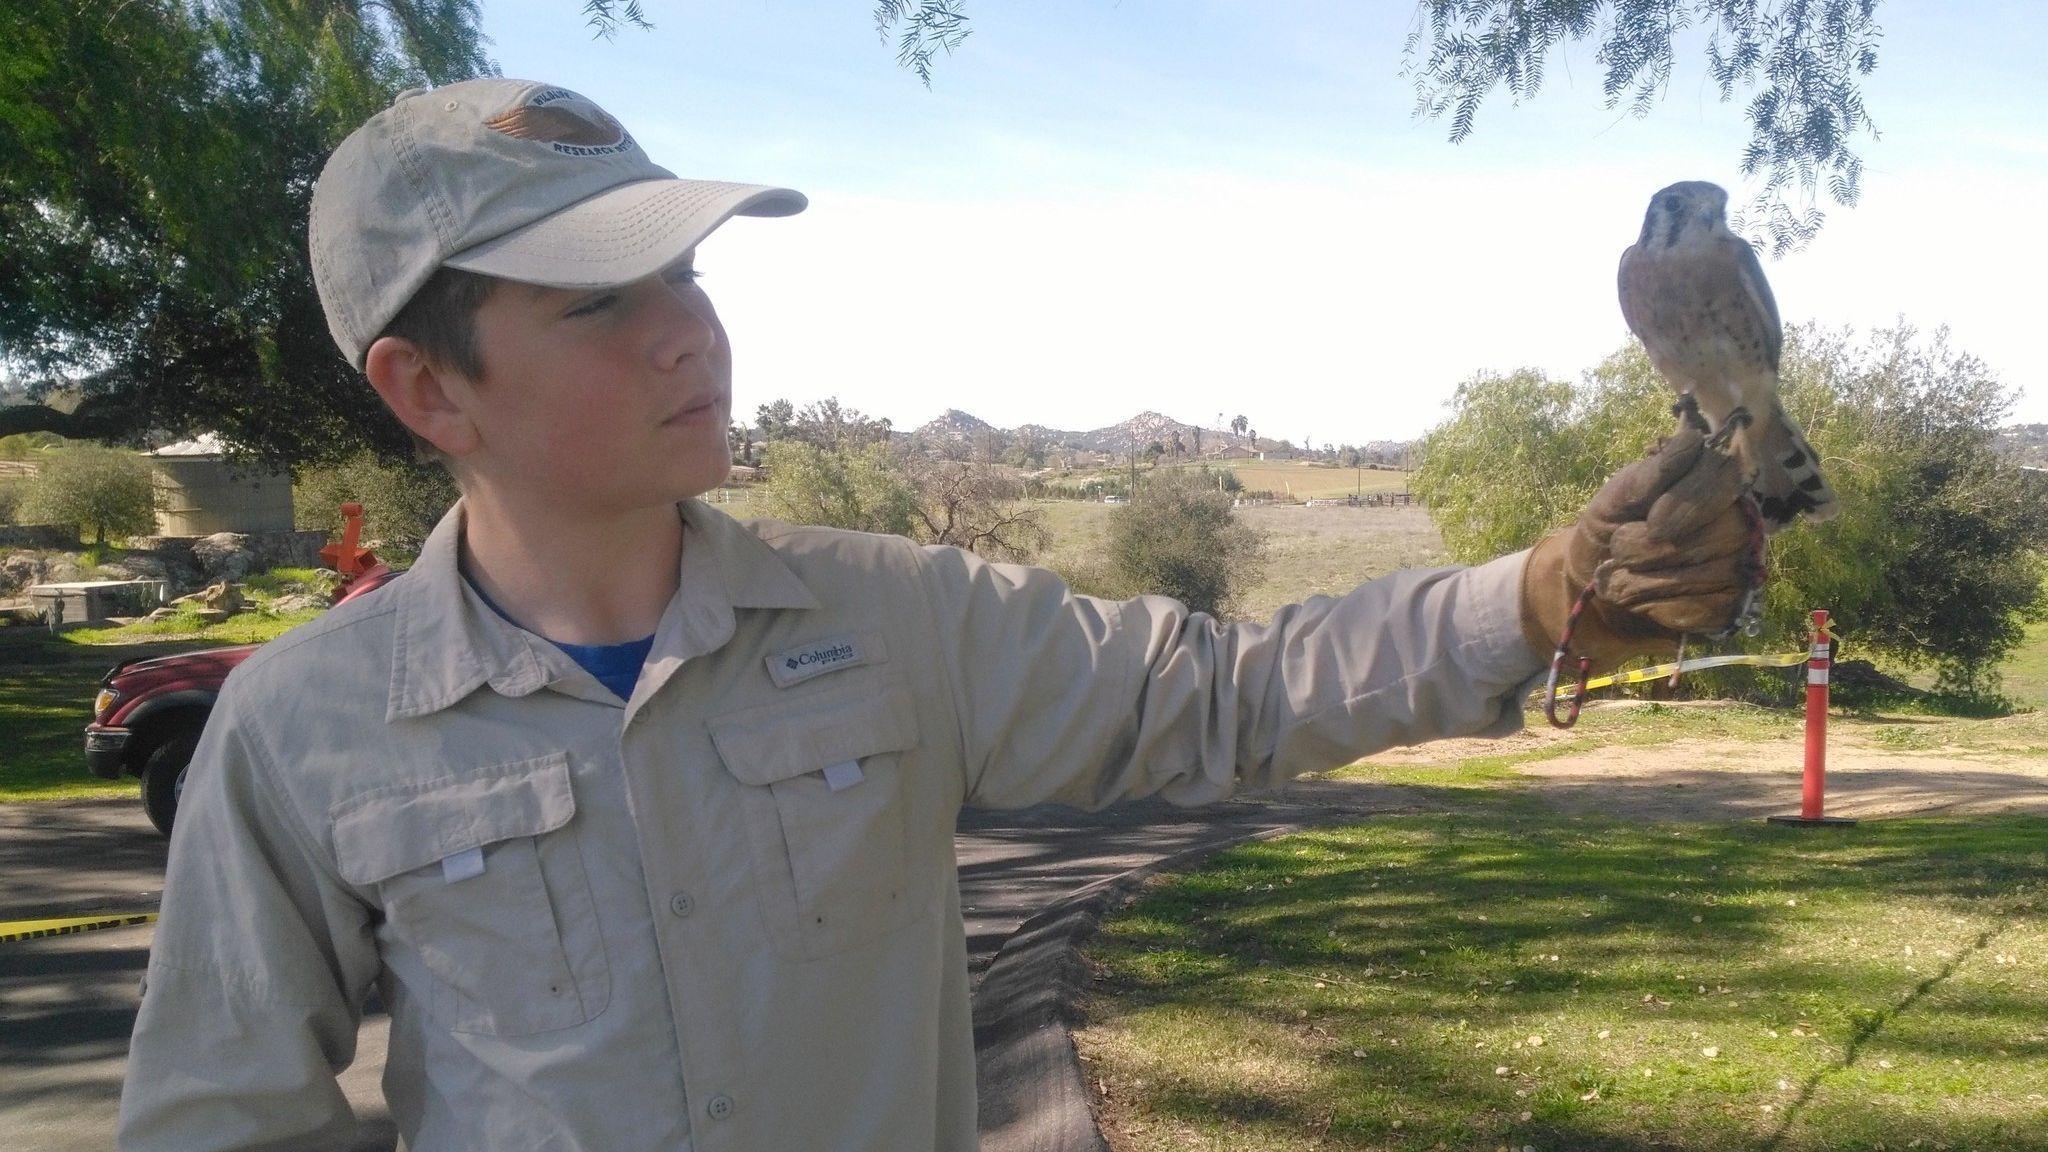 Wild Wings Research volunteer Carter Gailband displays a male American kestrel named Homer.